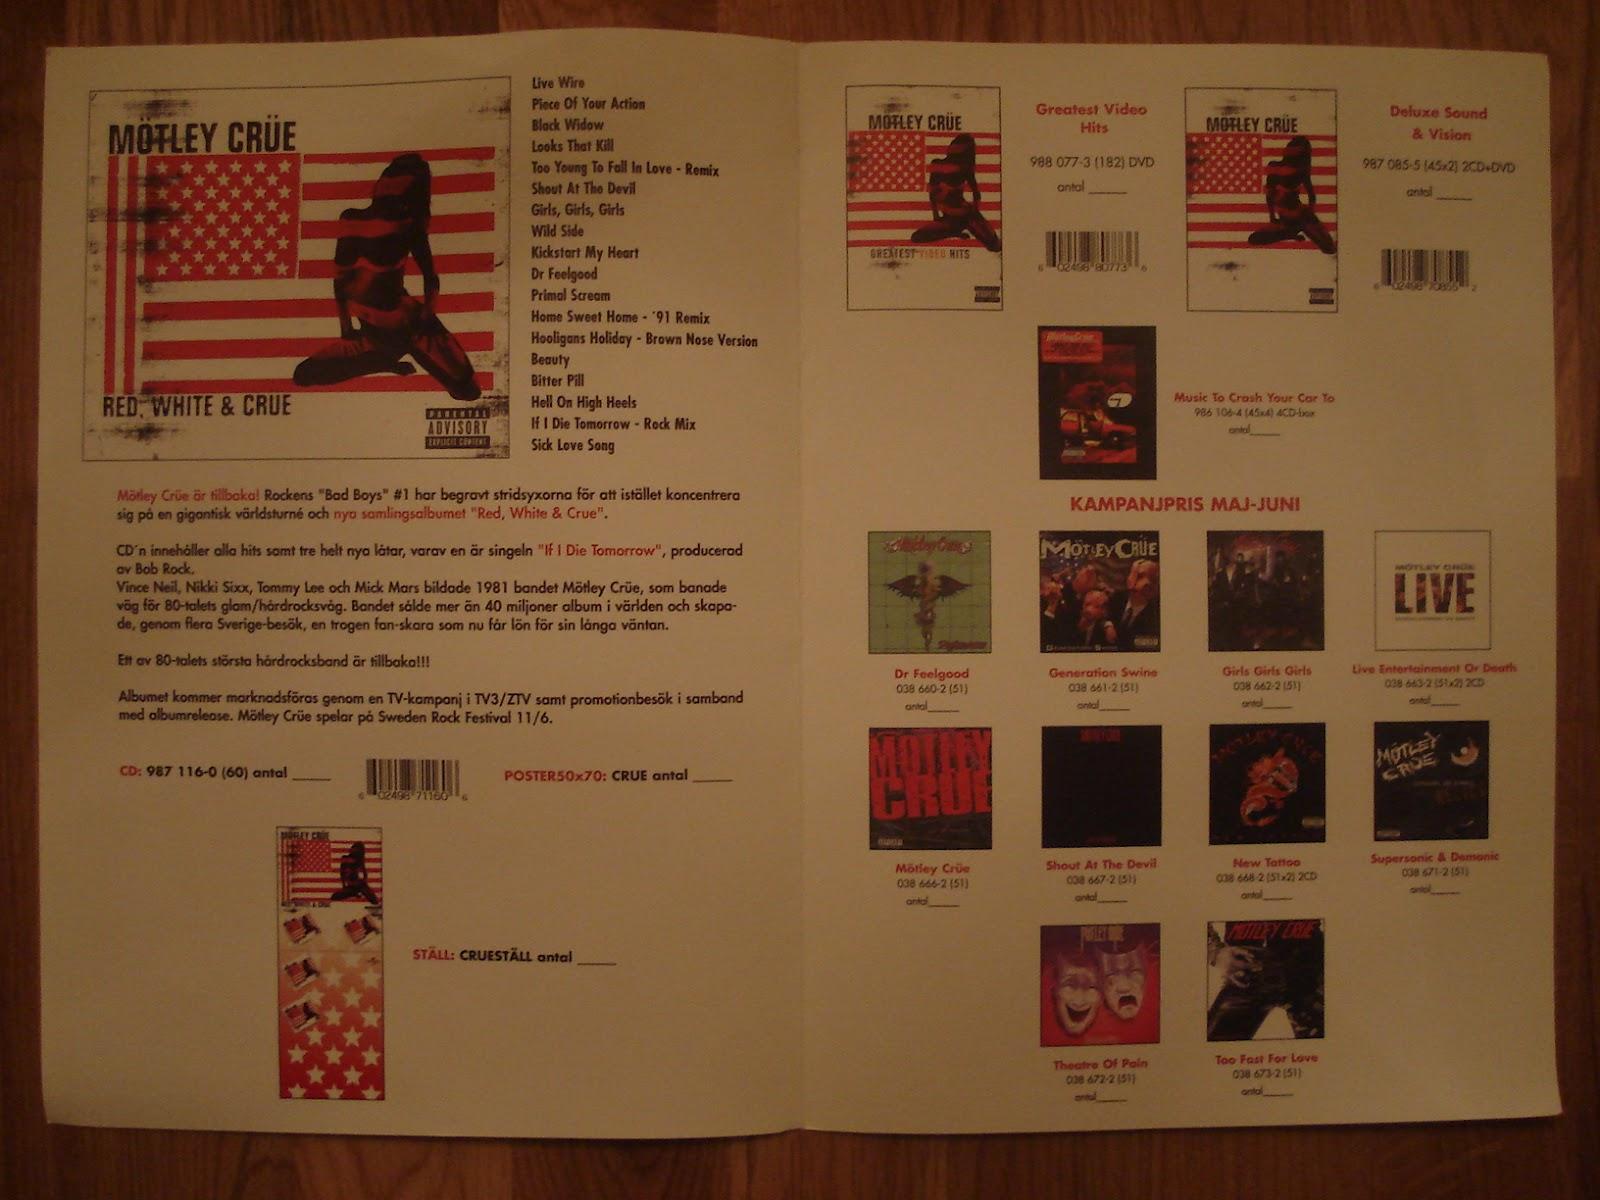 red white and crue cd